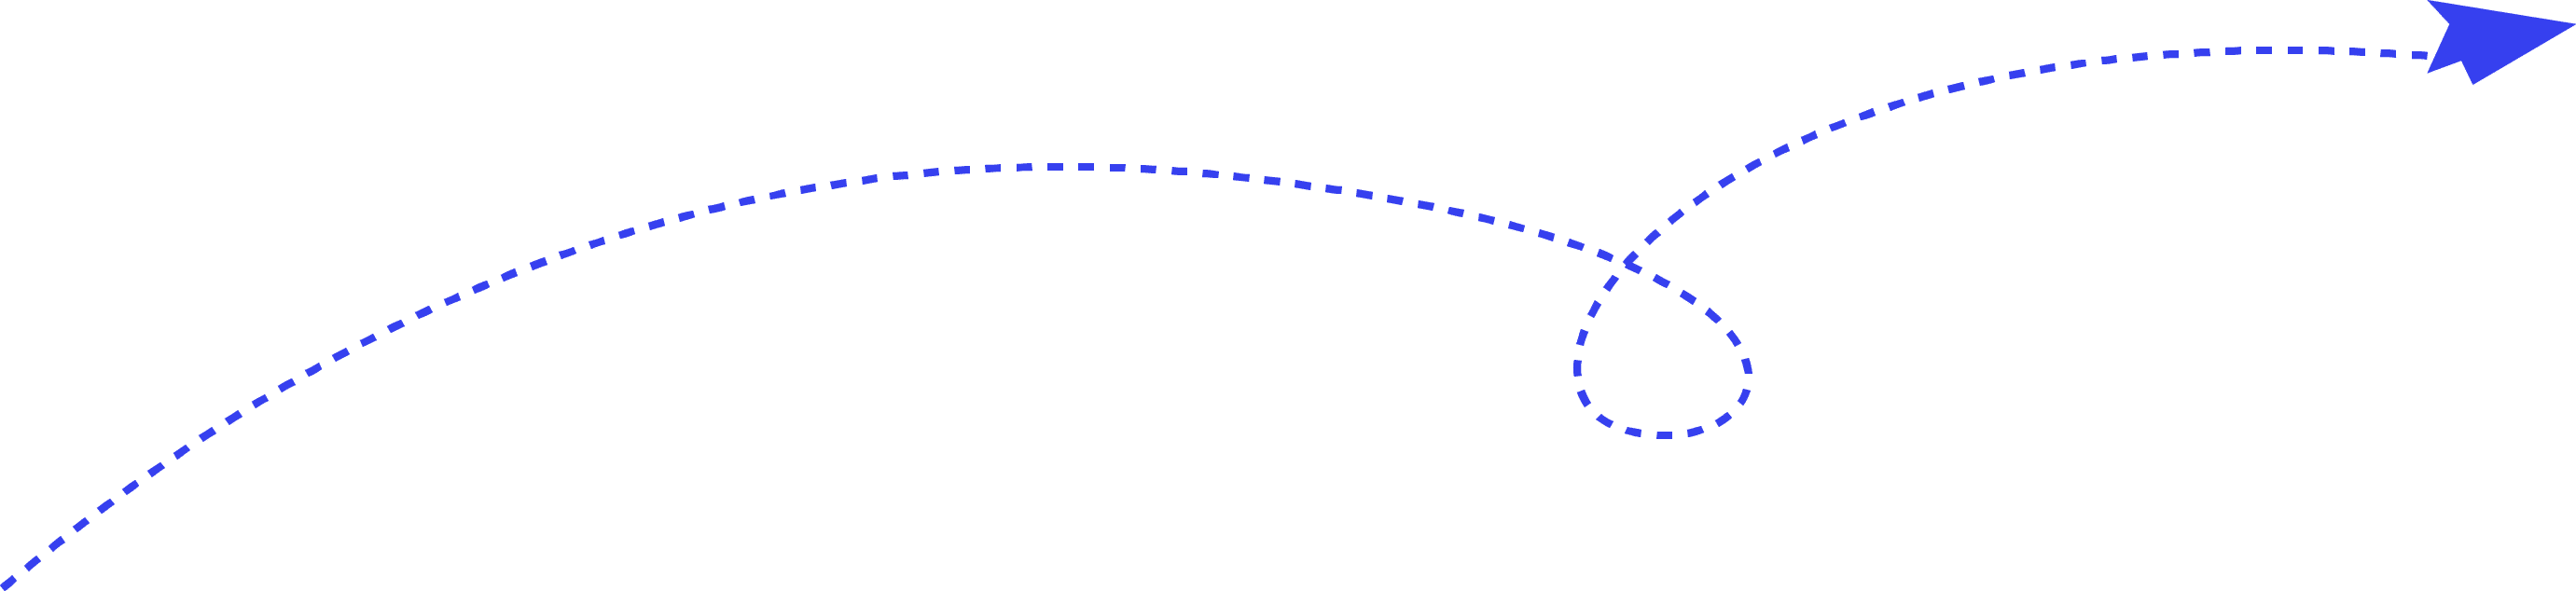 fleche enveloppe vers gauche - illu - bob desk